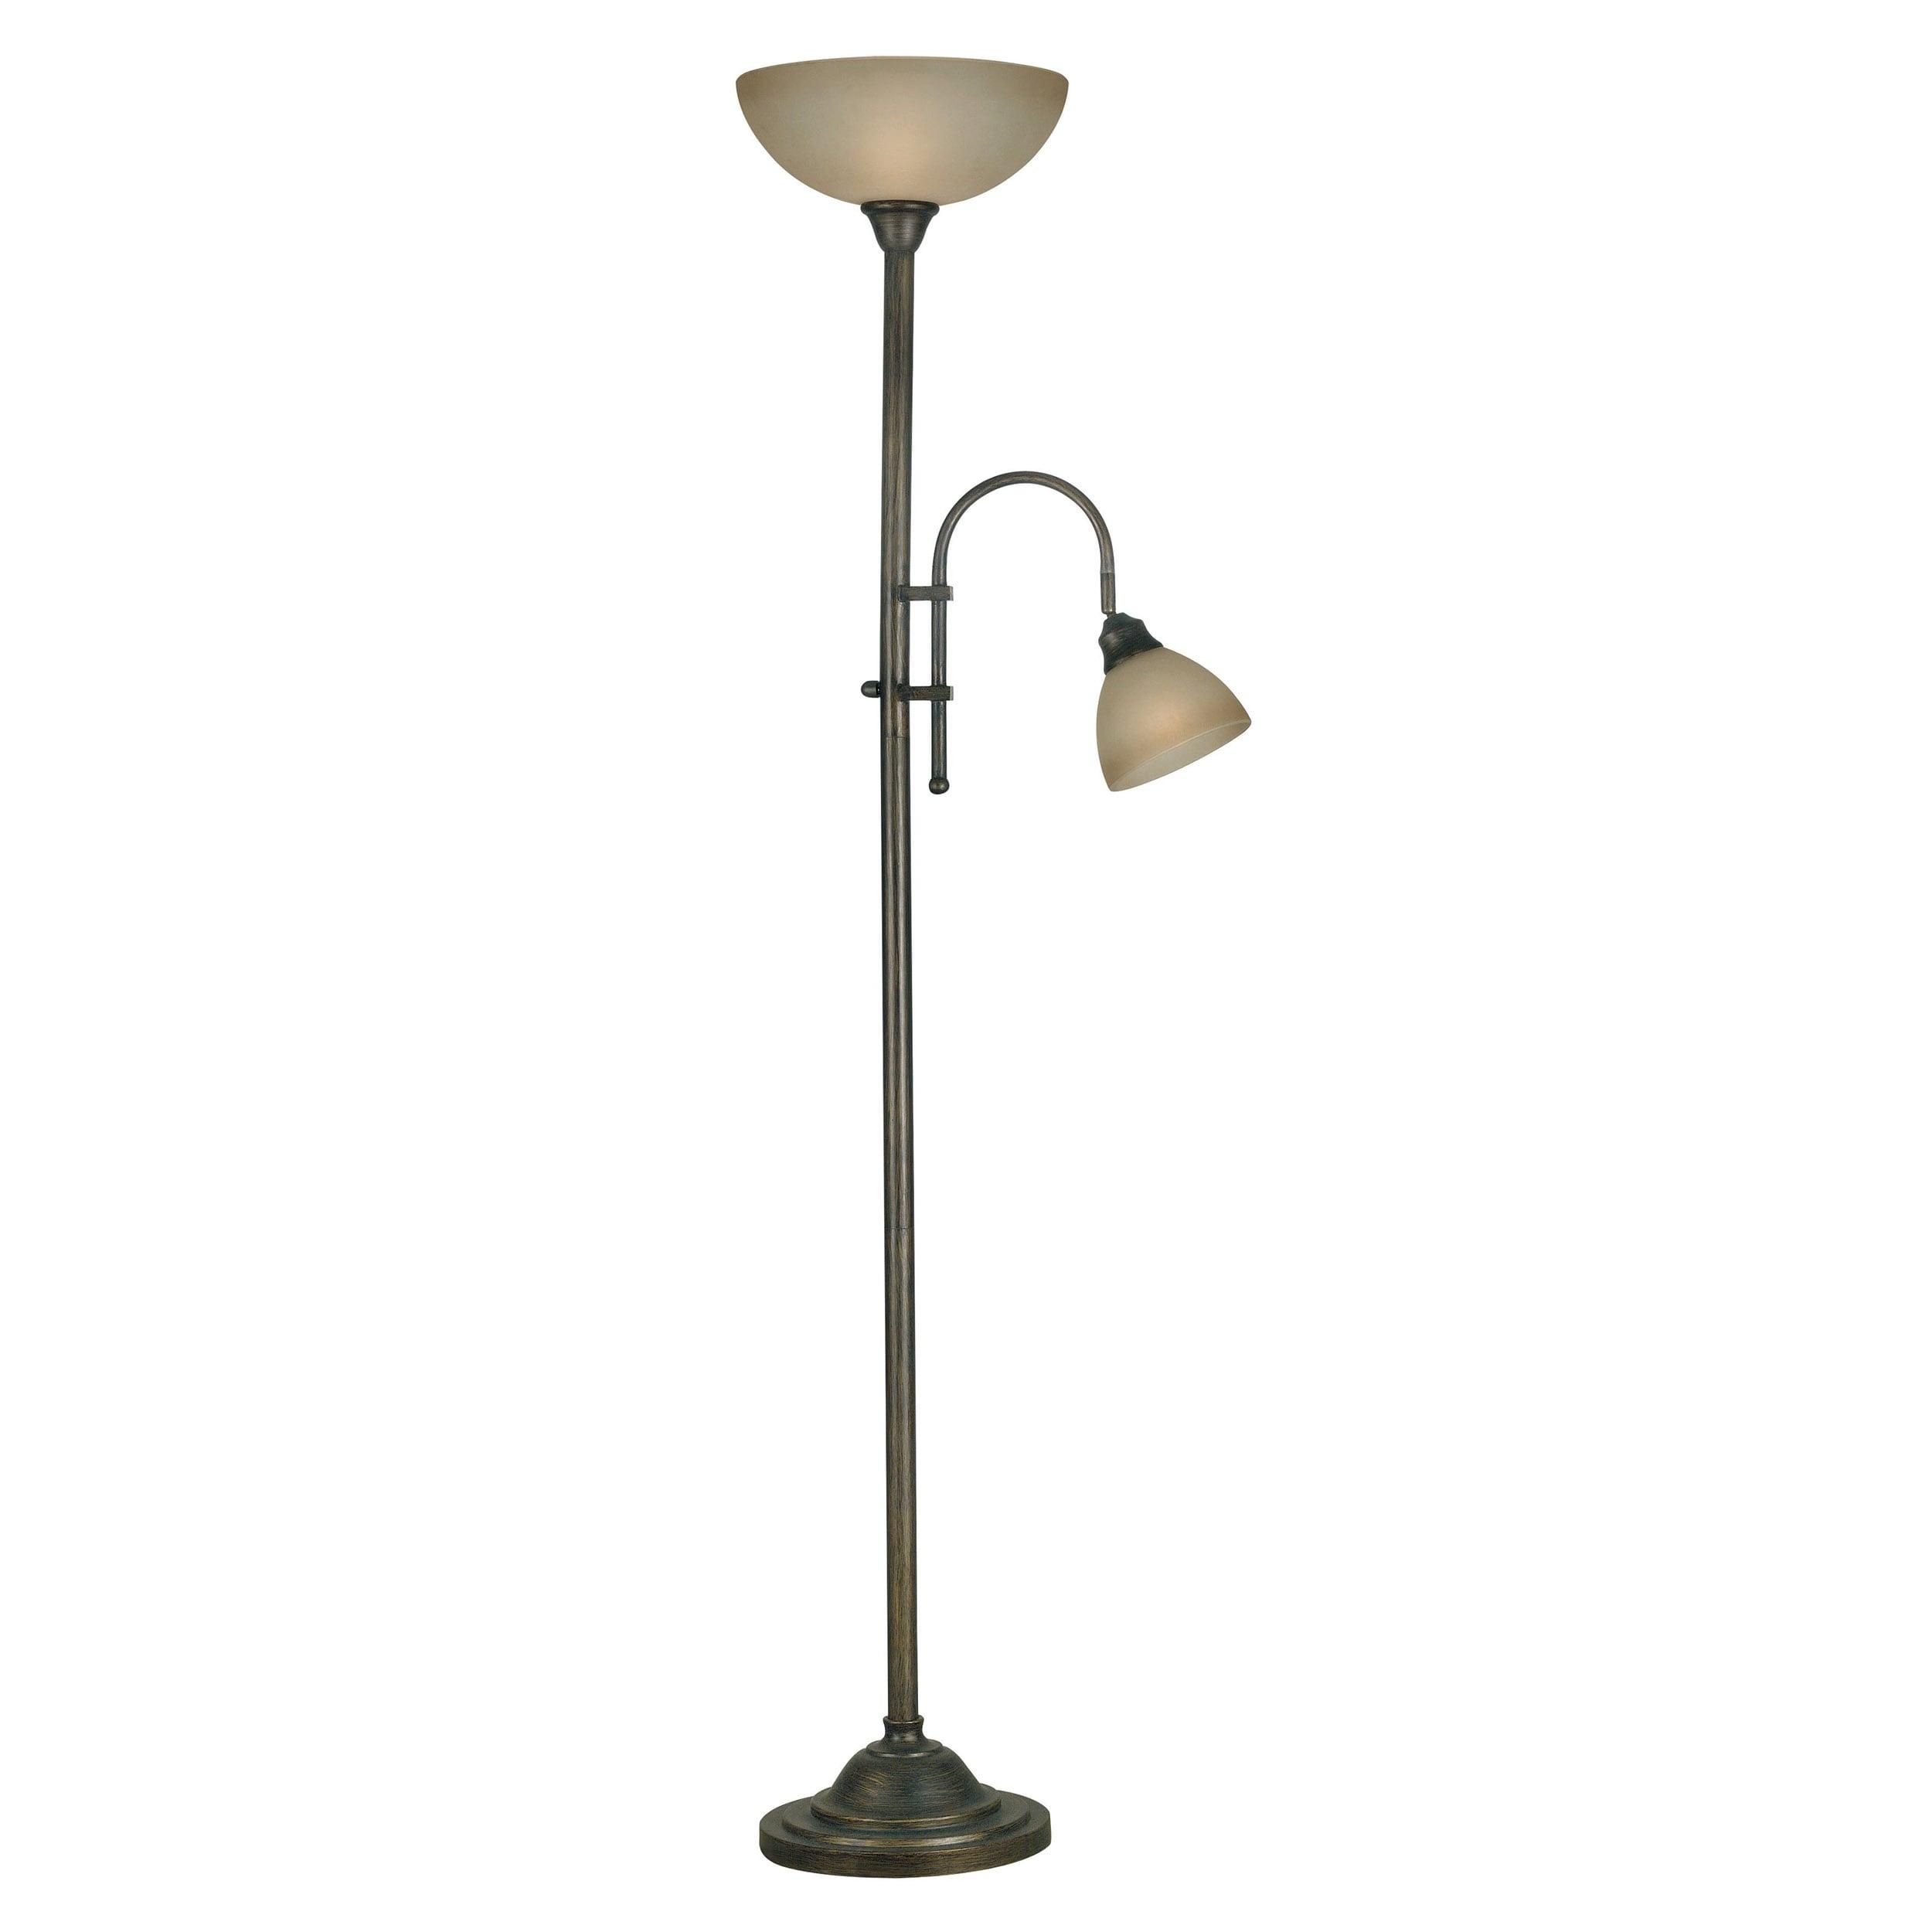 shopping great deals on design craft floor lamps. Black Bedroom Furniture Sets. Home Design Ideas